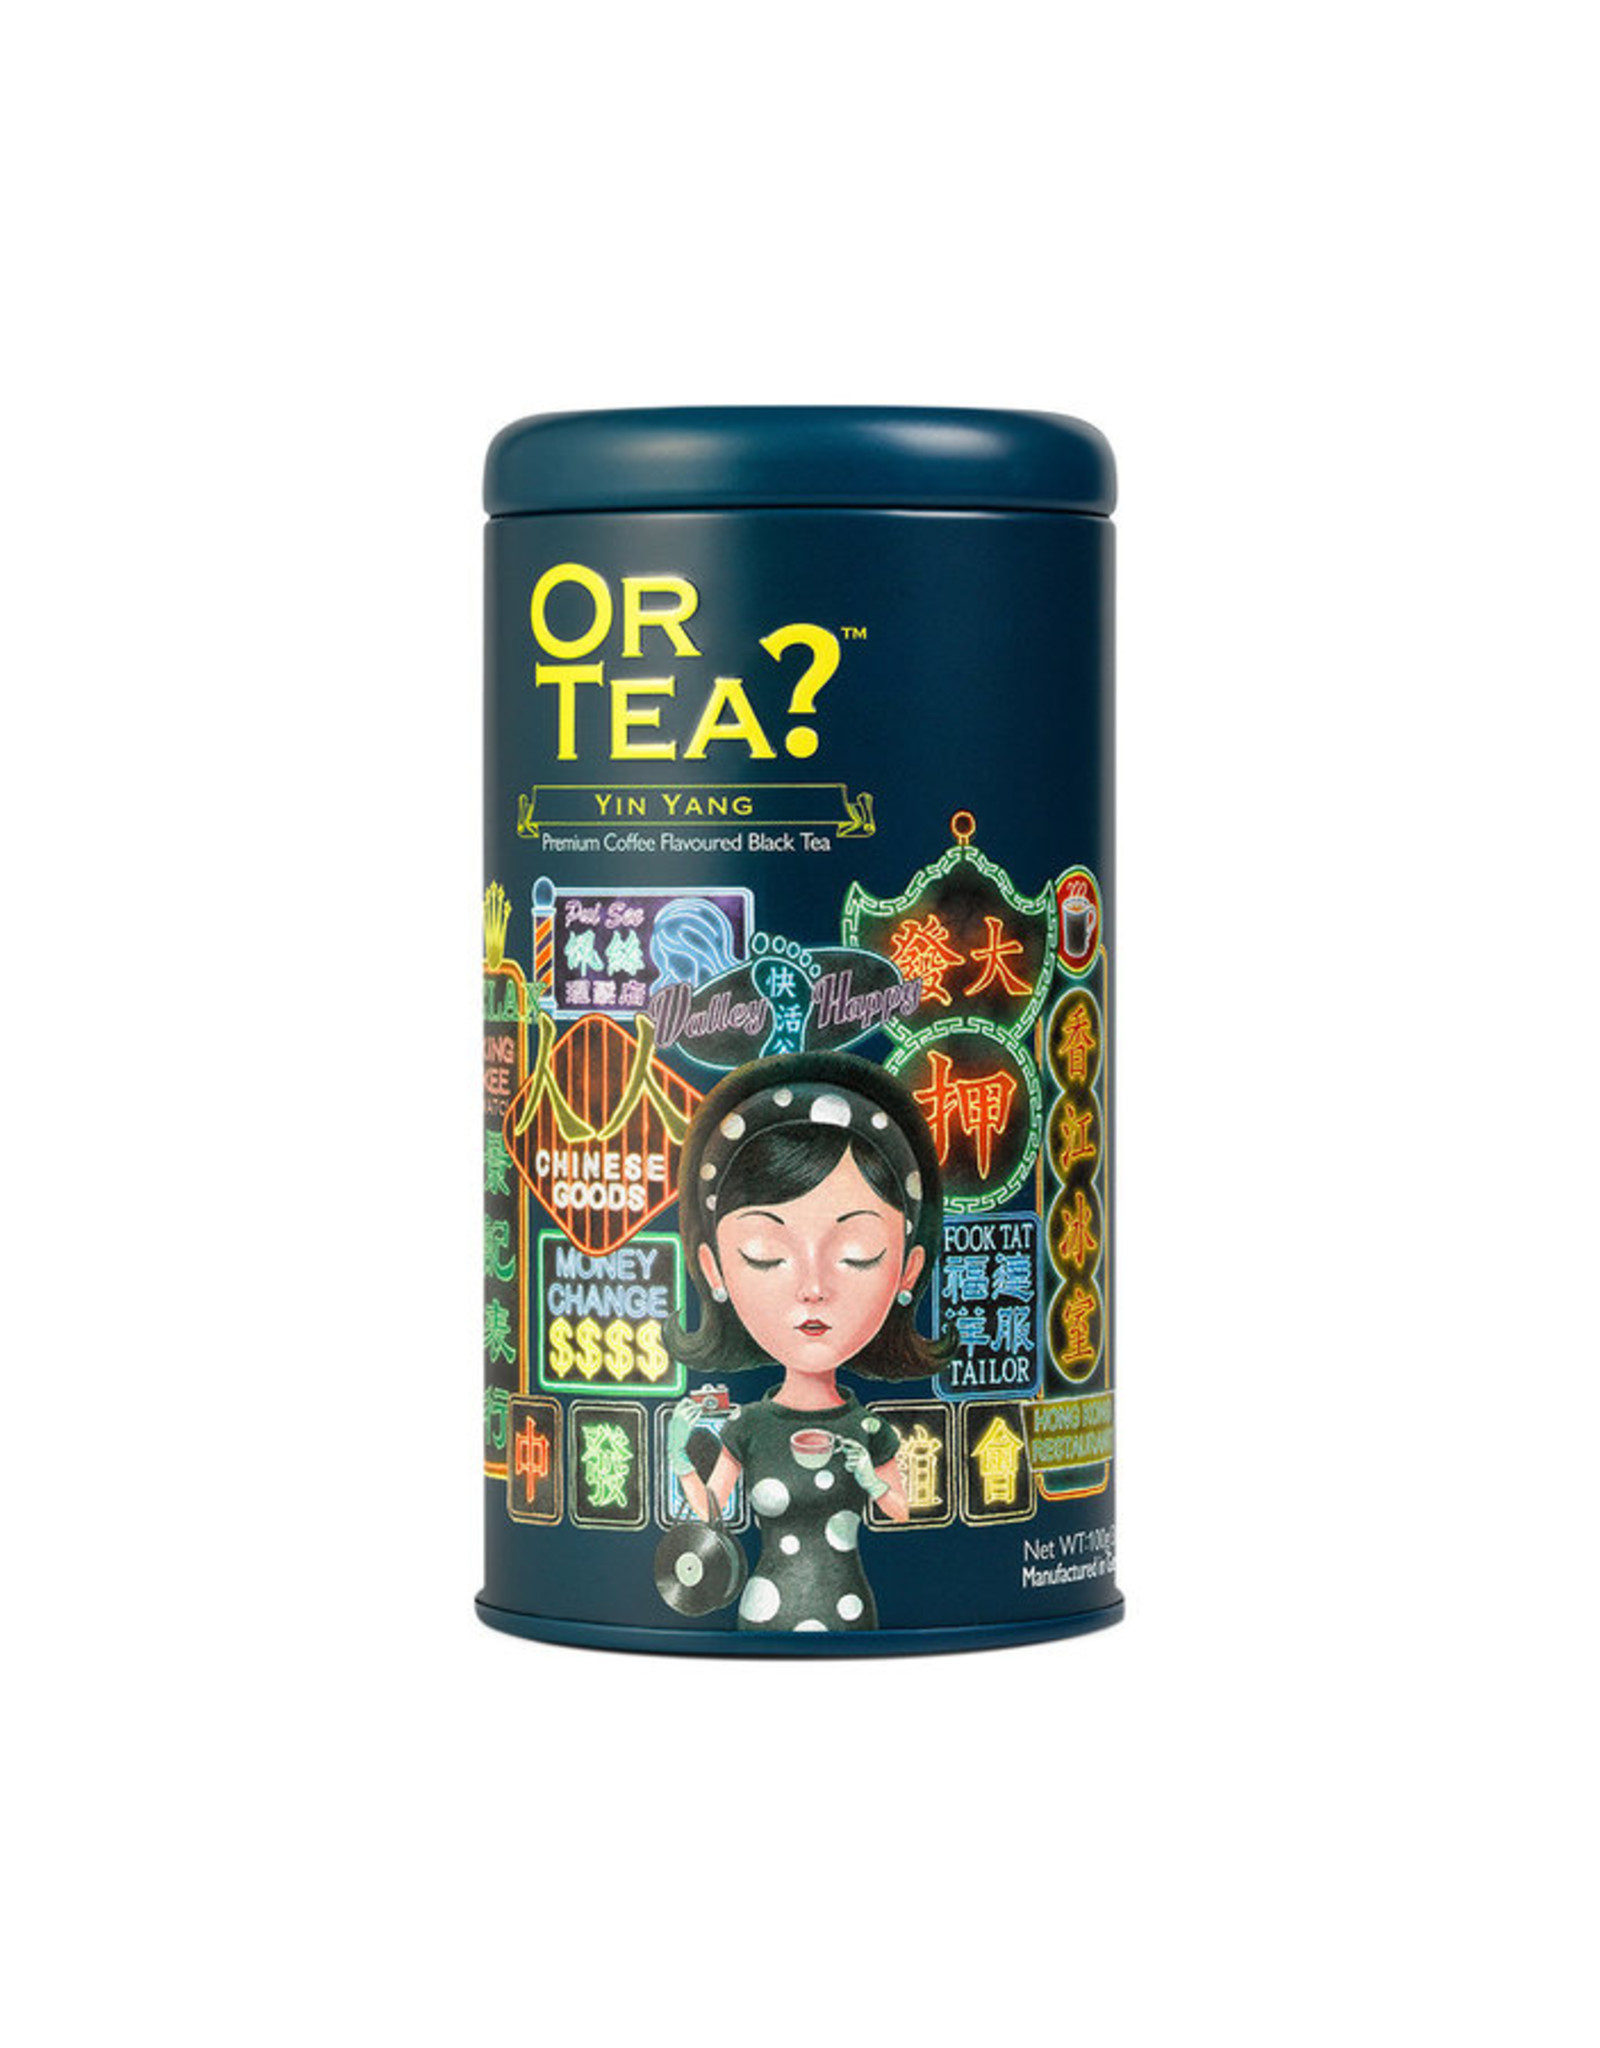 Or Tea? Yin Yang - Tin Canister